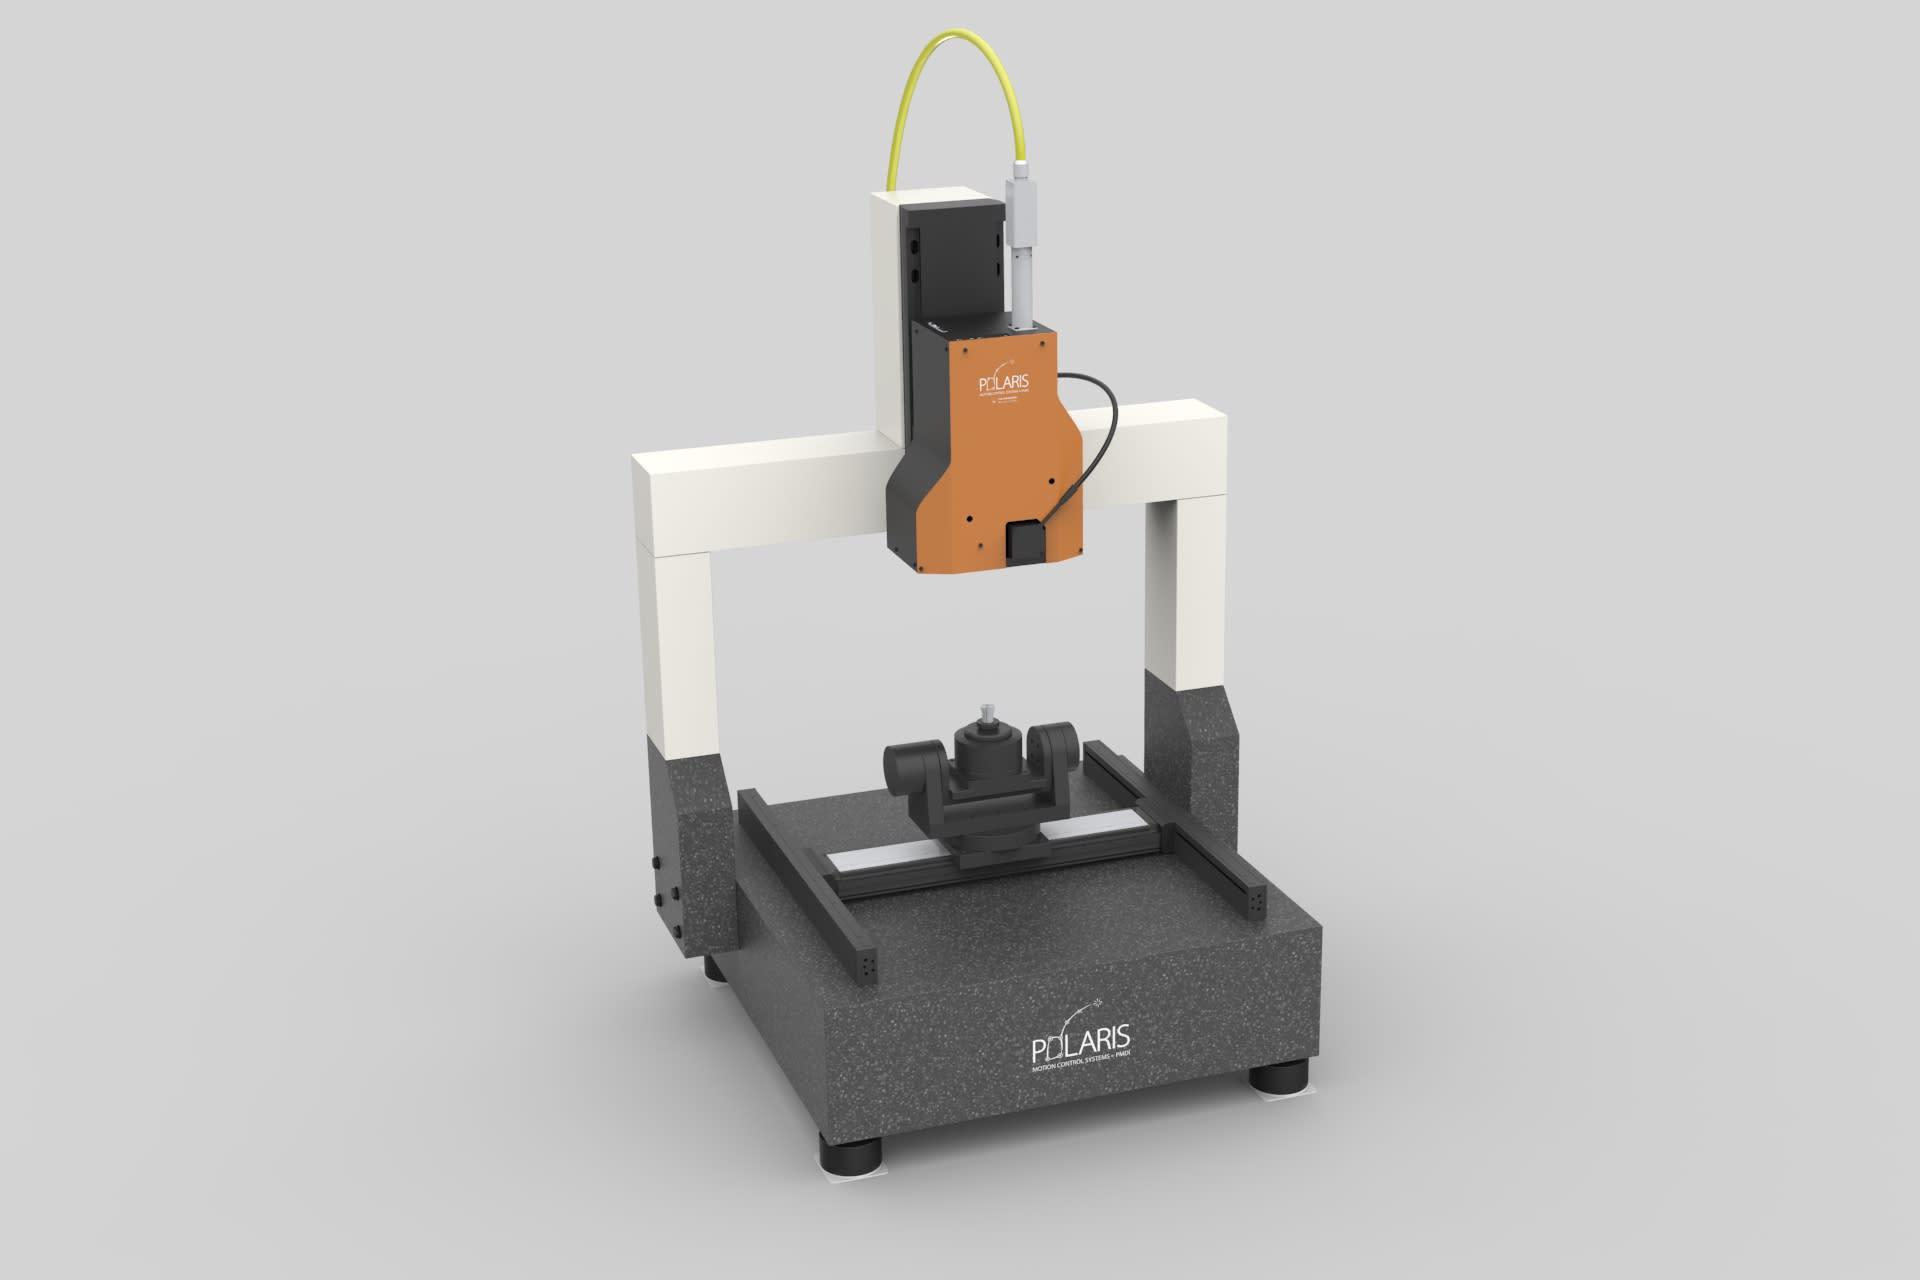 Polaris Motion - Advanced Motion Control Systems